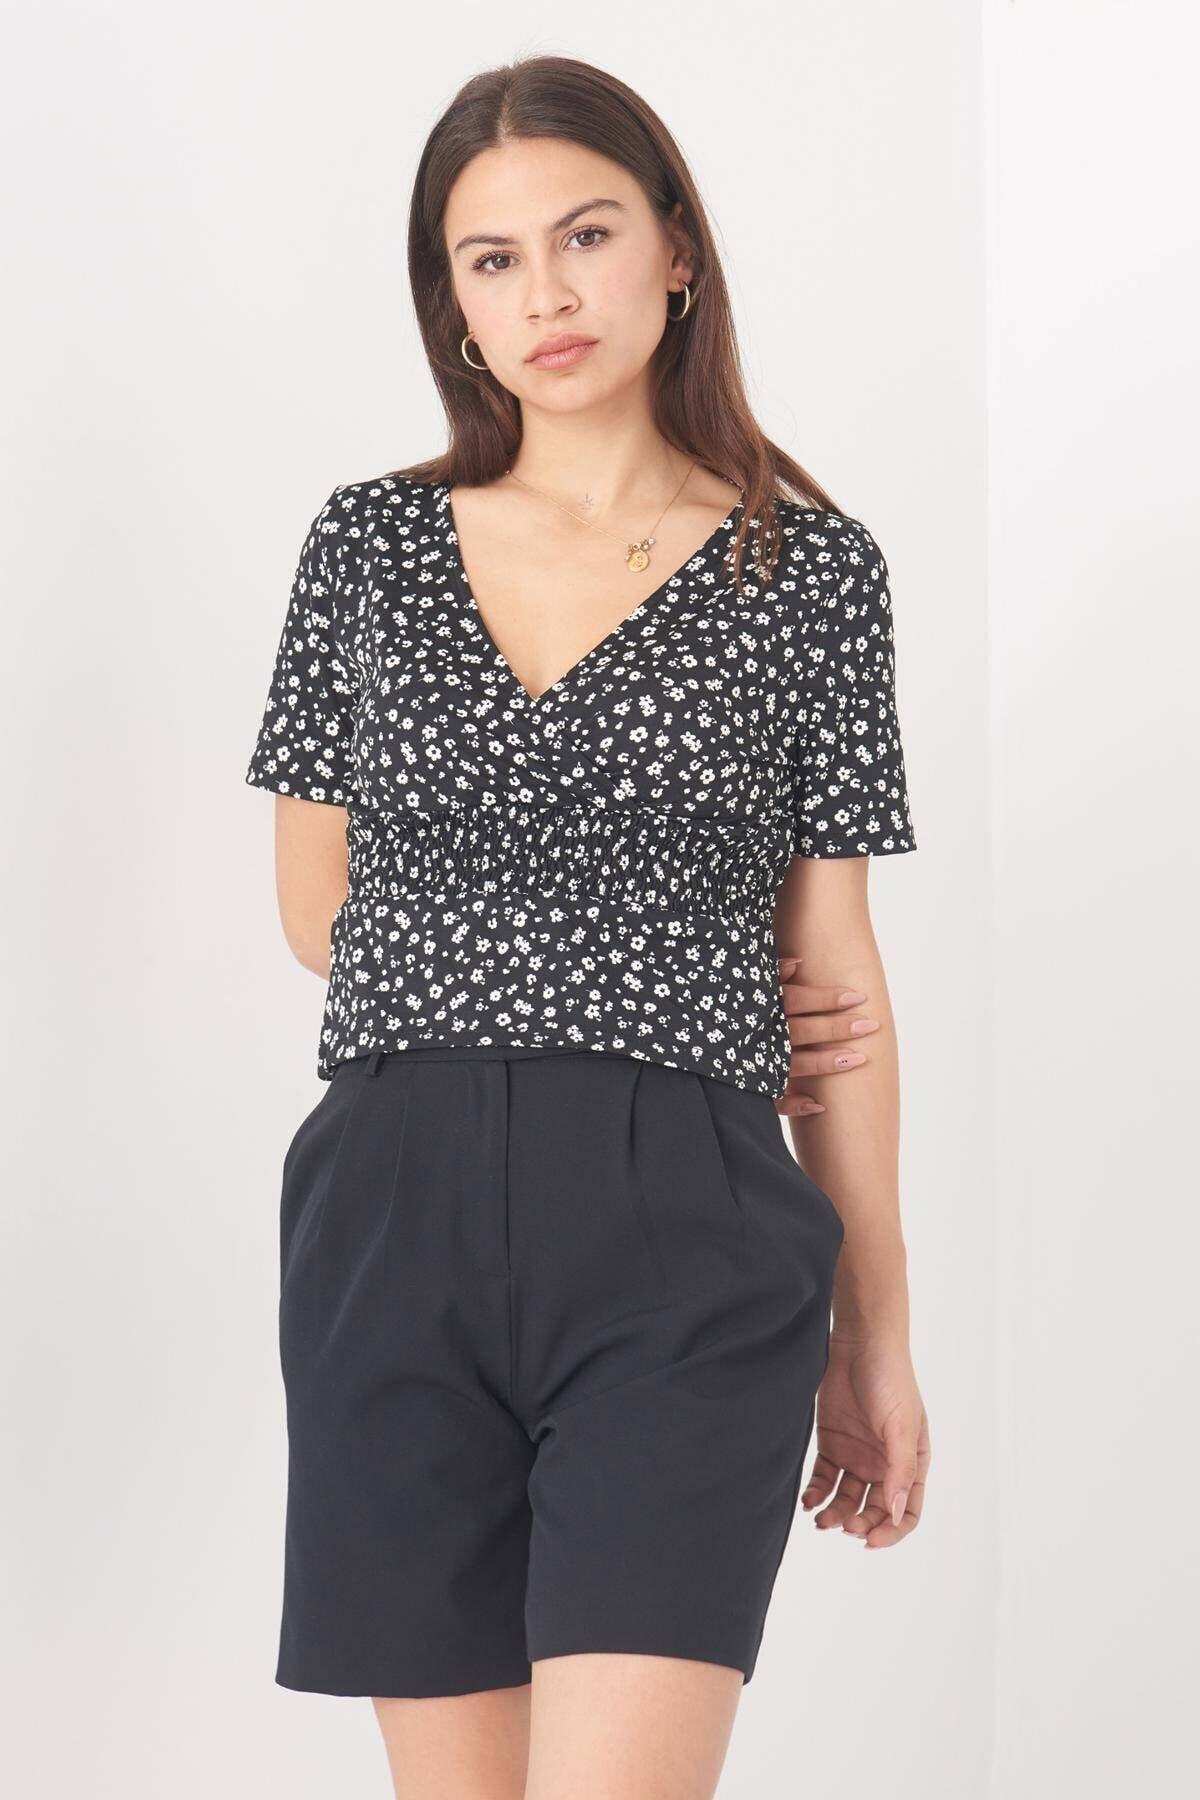 Addax Kadın Siyah Çiçek Desenli Kruvaze Bluz B0998 - W13 ADX-0000022549